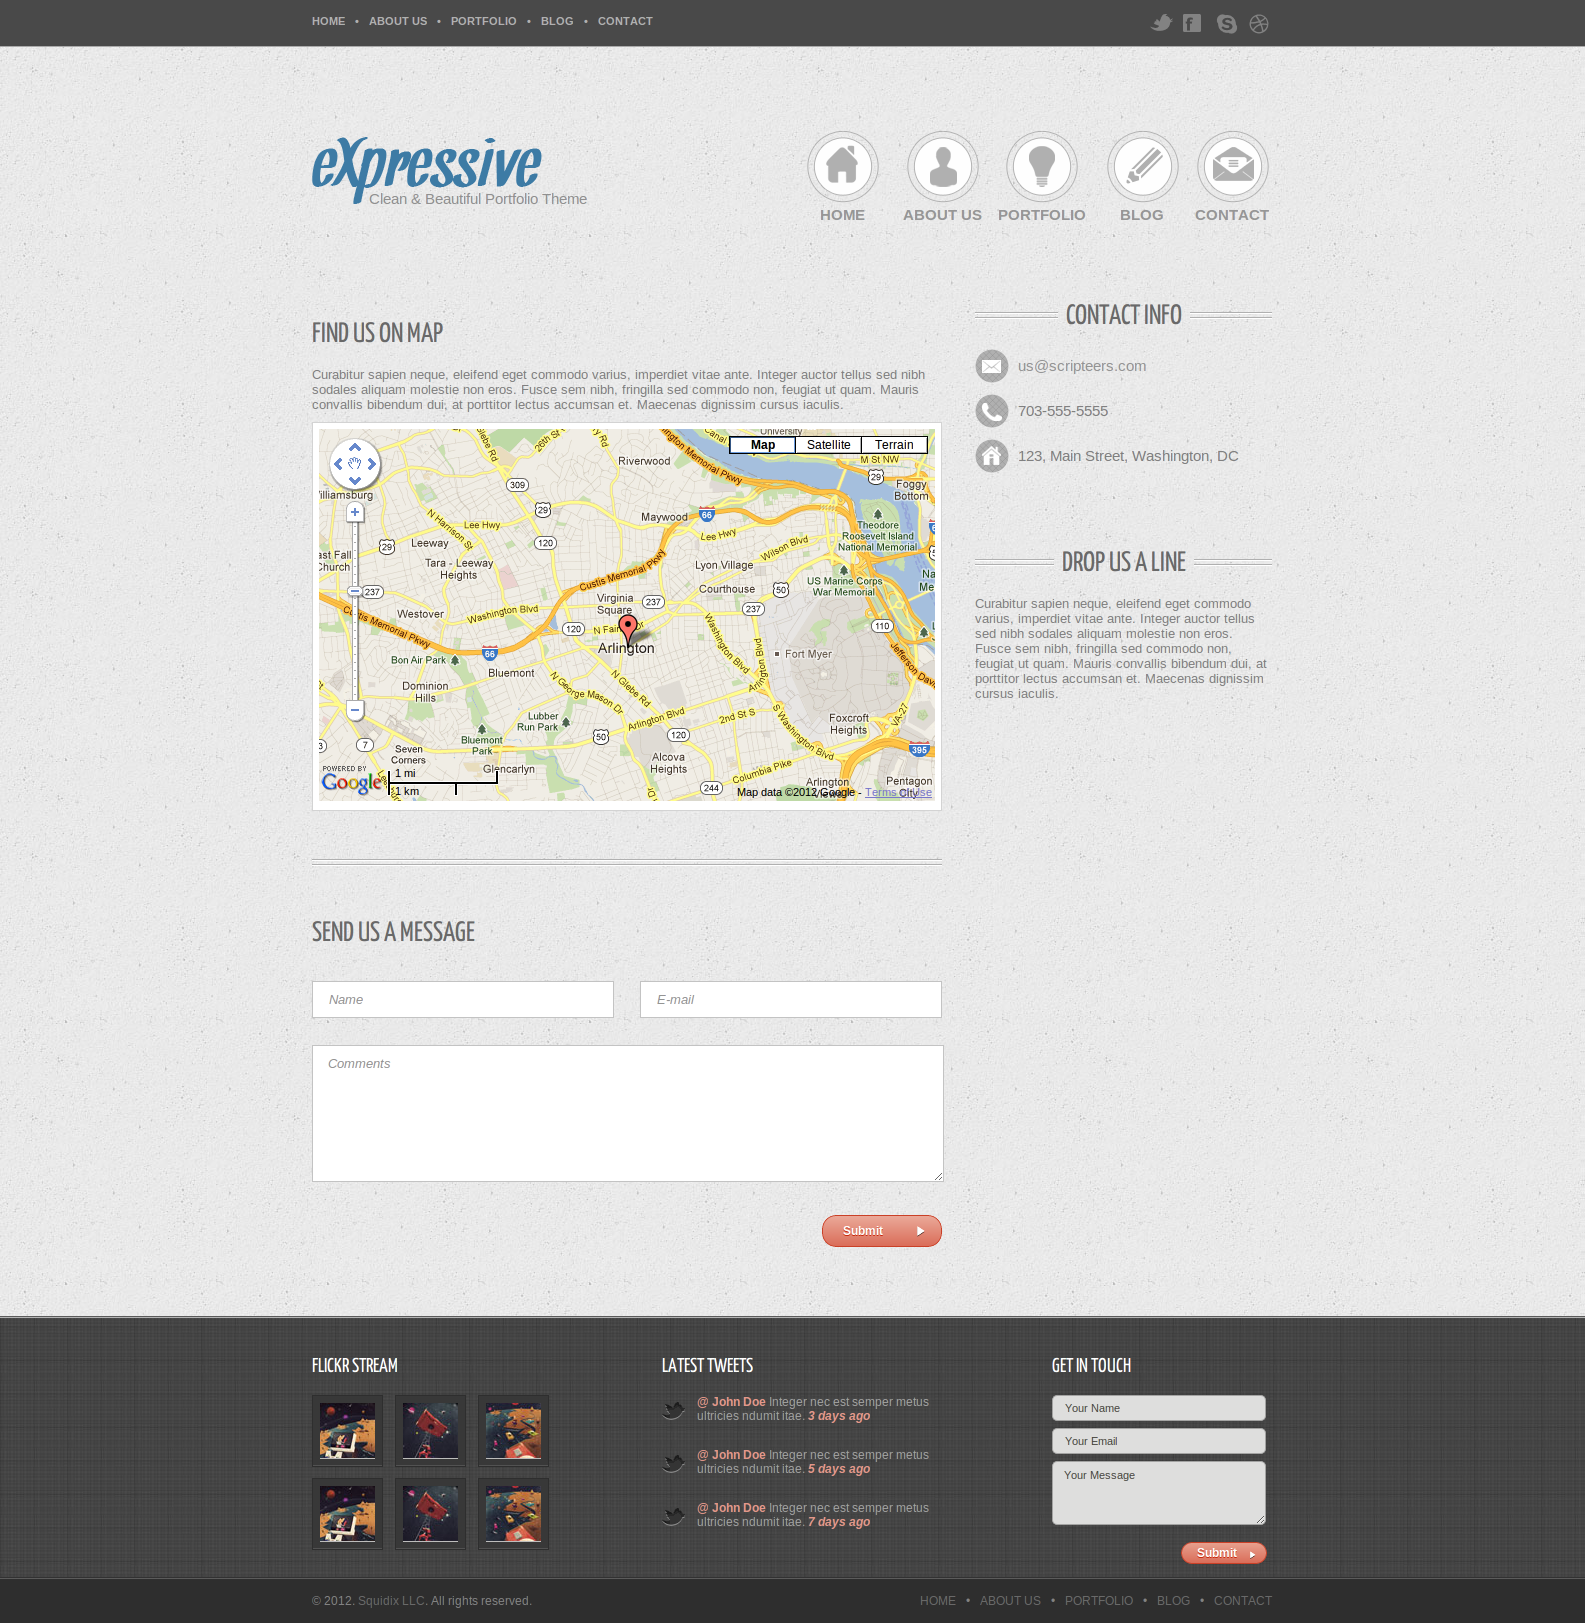 Expressive - Fully Responsive HTML5/CSS3 Portfolio